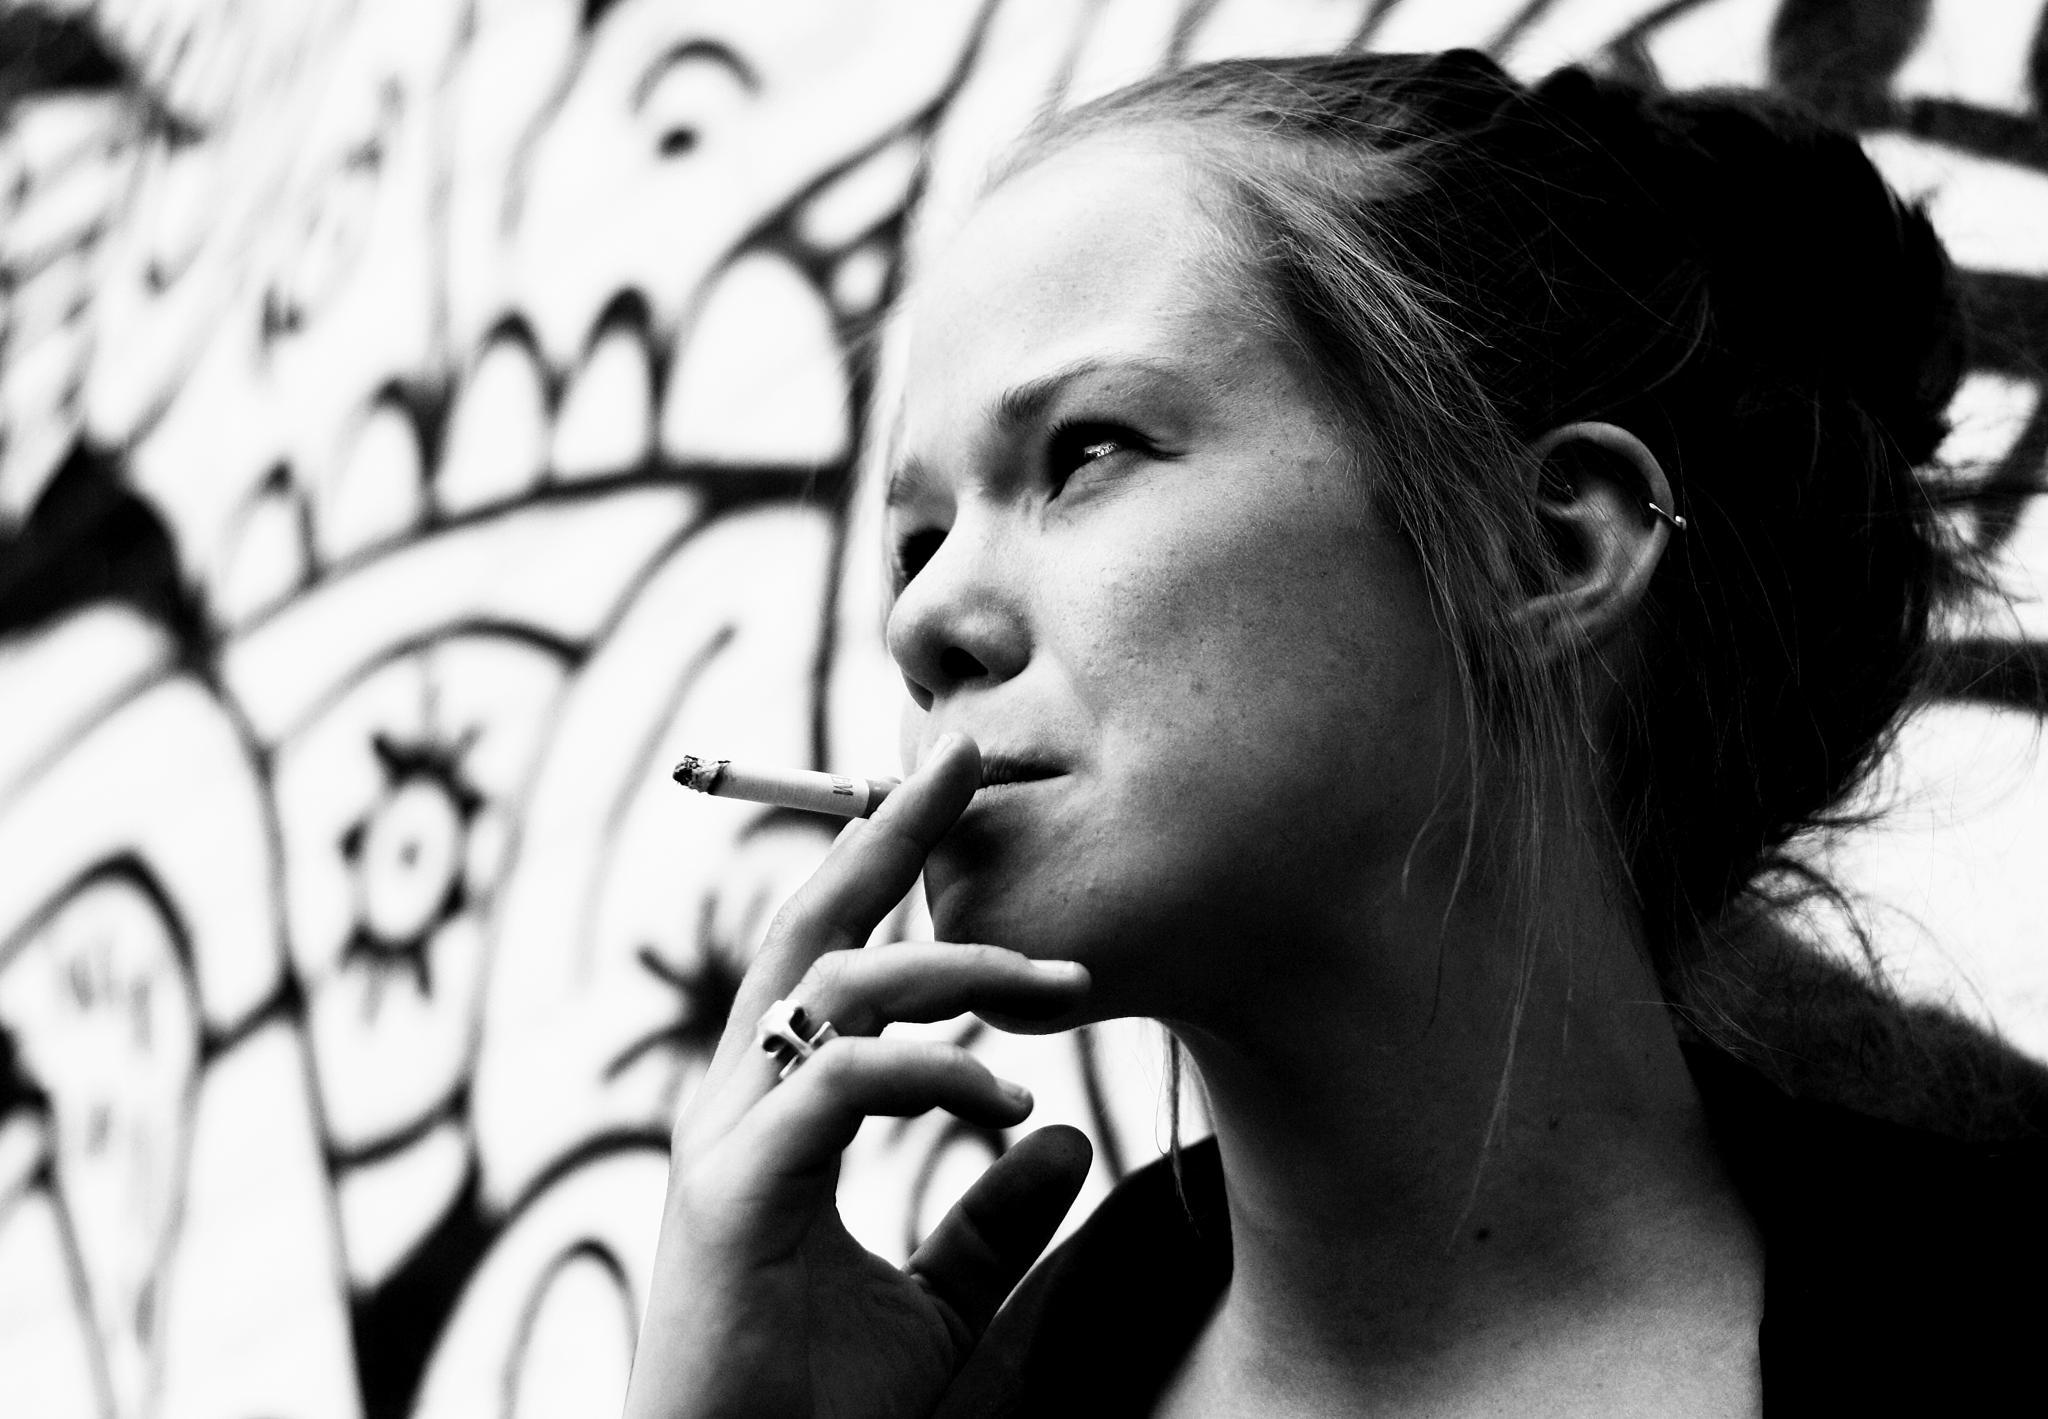 Smoker by Ricardo Ruytenberg